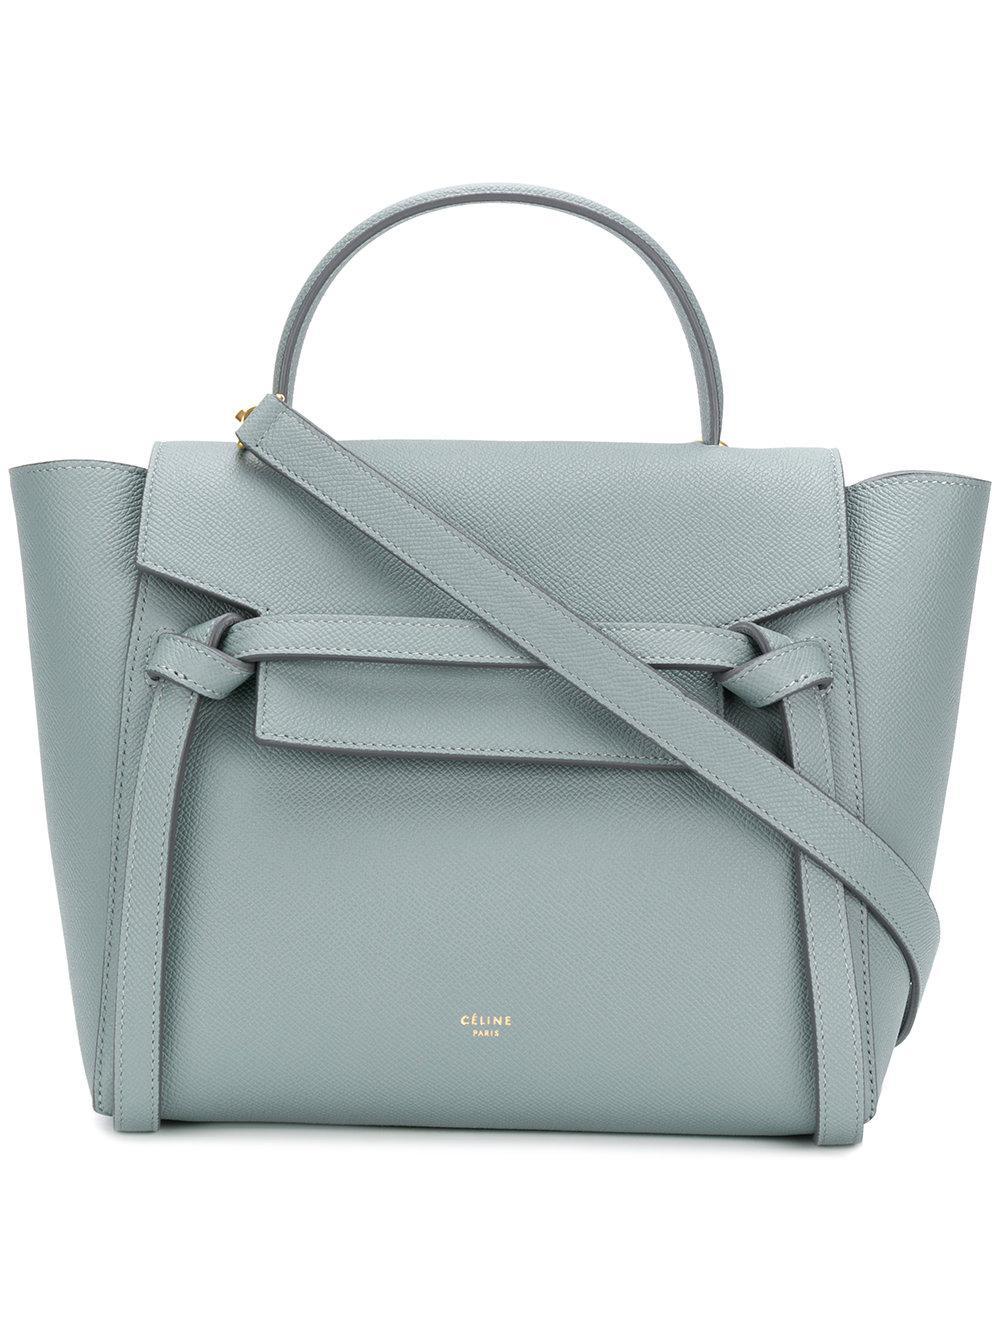 Celine Micro Leather Belt Bag In Grey Gray Lyst